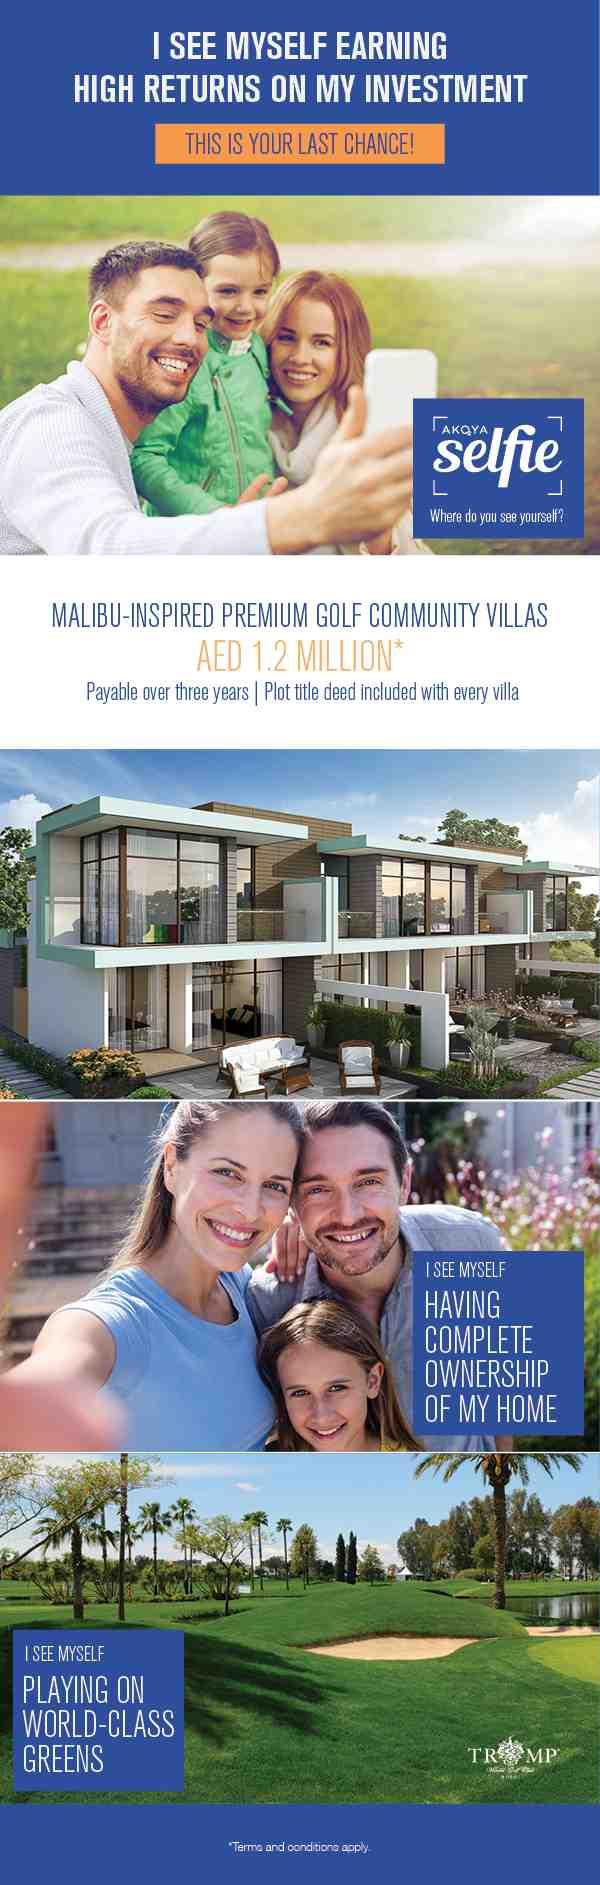 akoya-selfie-villas-english